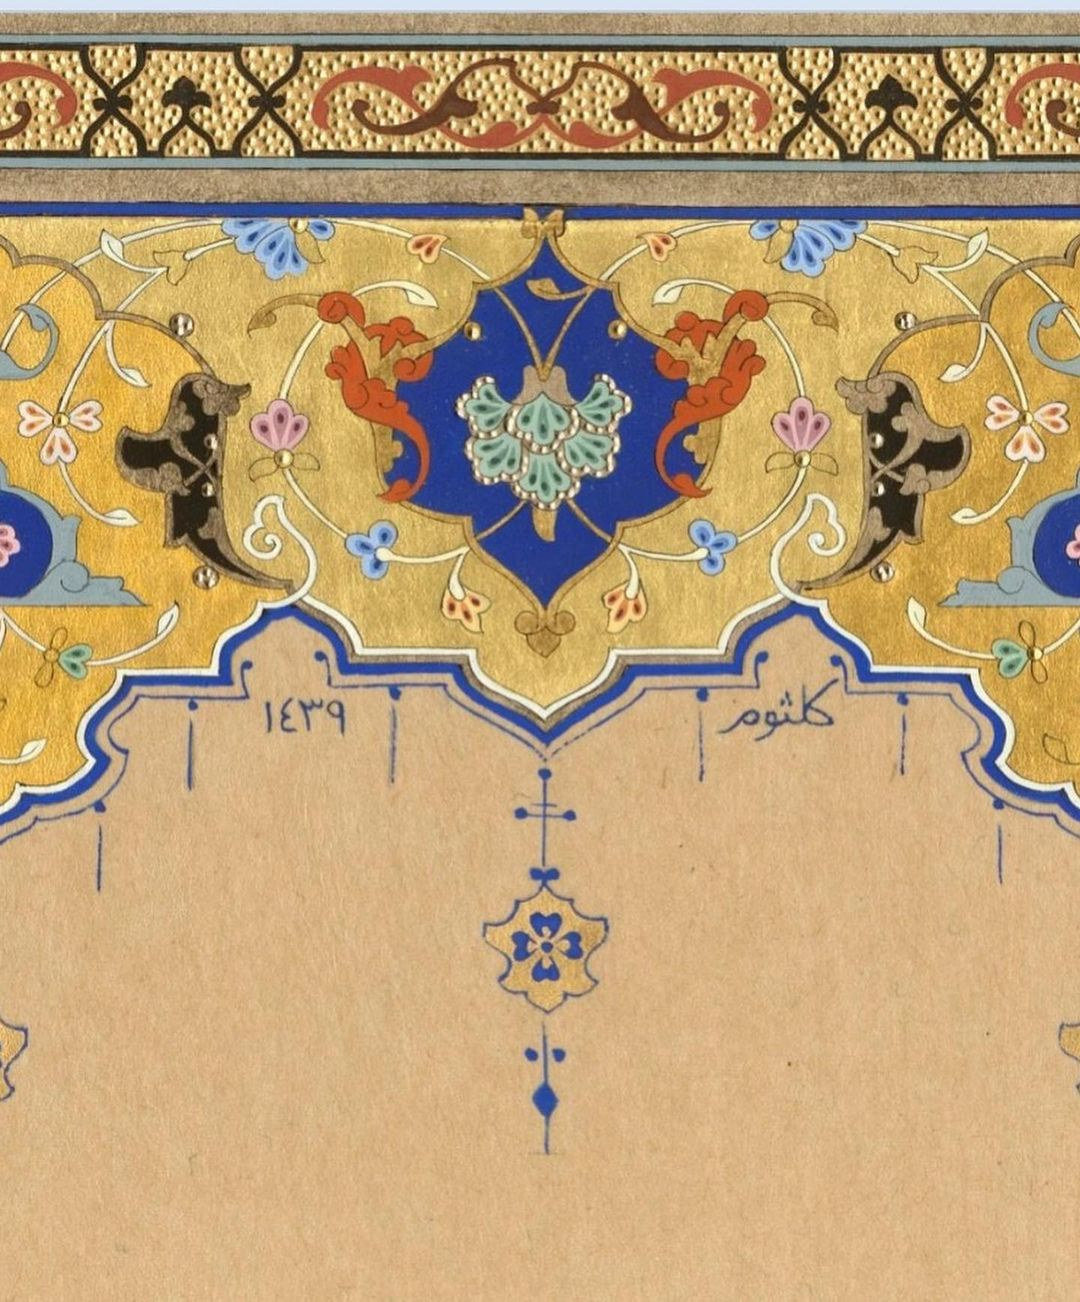 Apk Website For Arabic Calligraphy بِسْمِ اللّٰهِ الرَّحْمٰنِ الرَّح۪يمِ اَلْحَمْدُ لِلّٰهِ رَبِّ الْـعَالَم۪ينَۙ ا... 1441 7